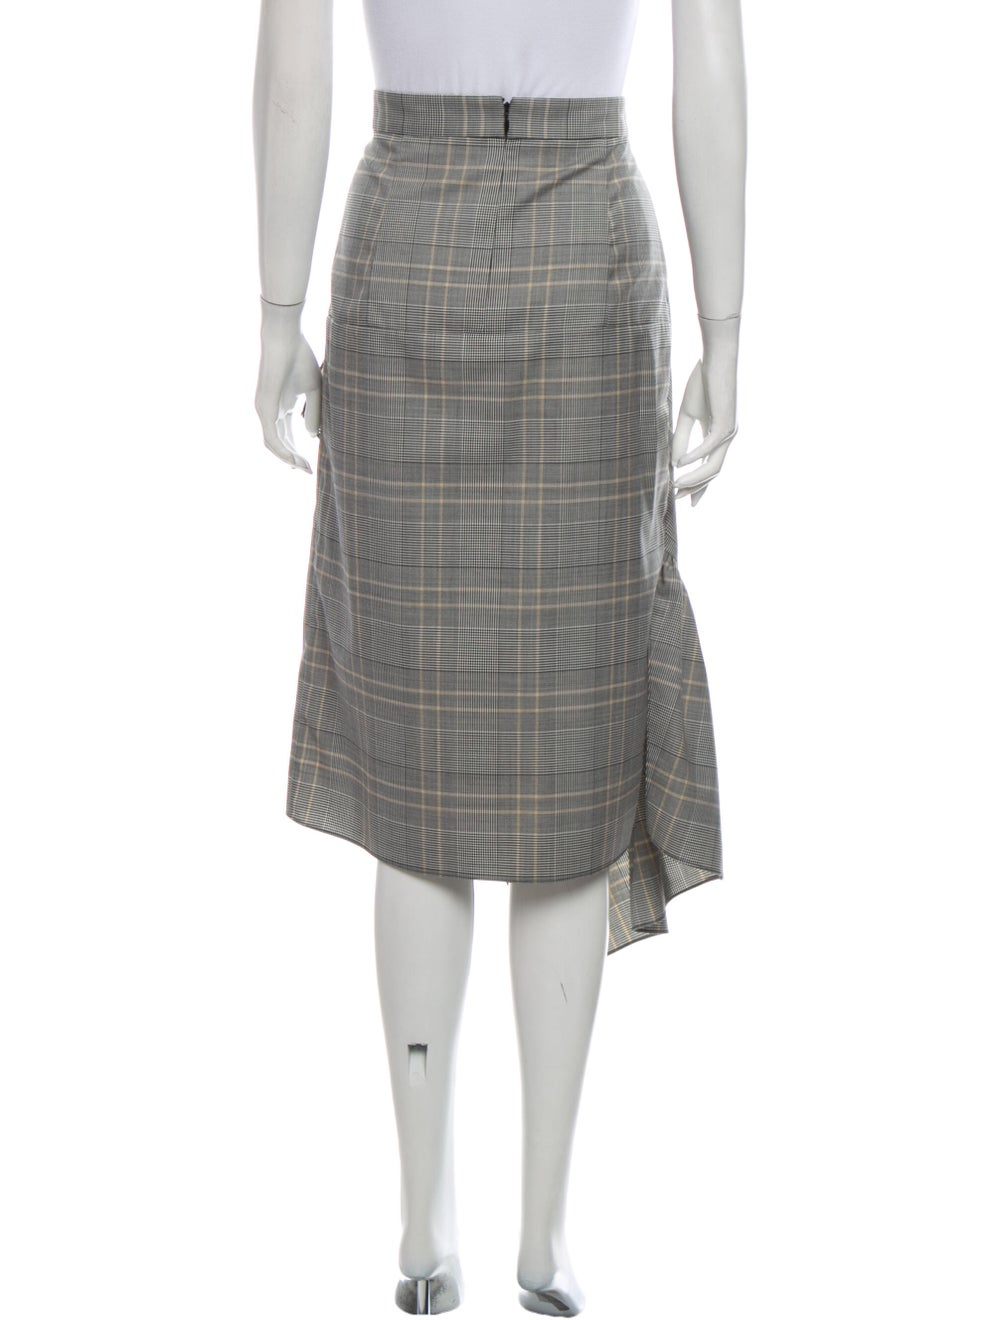 Tibi Plaid Print Midi Length Skirt - image 3